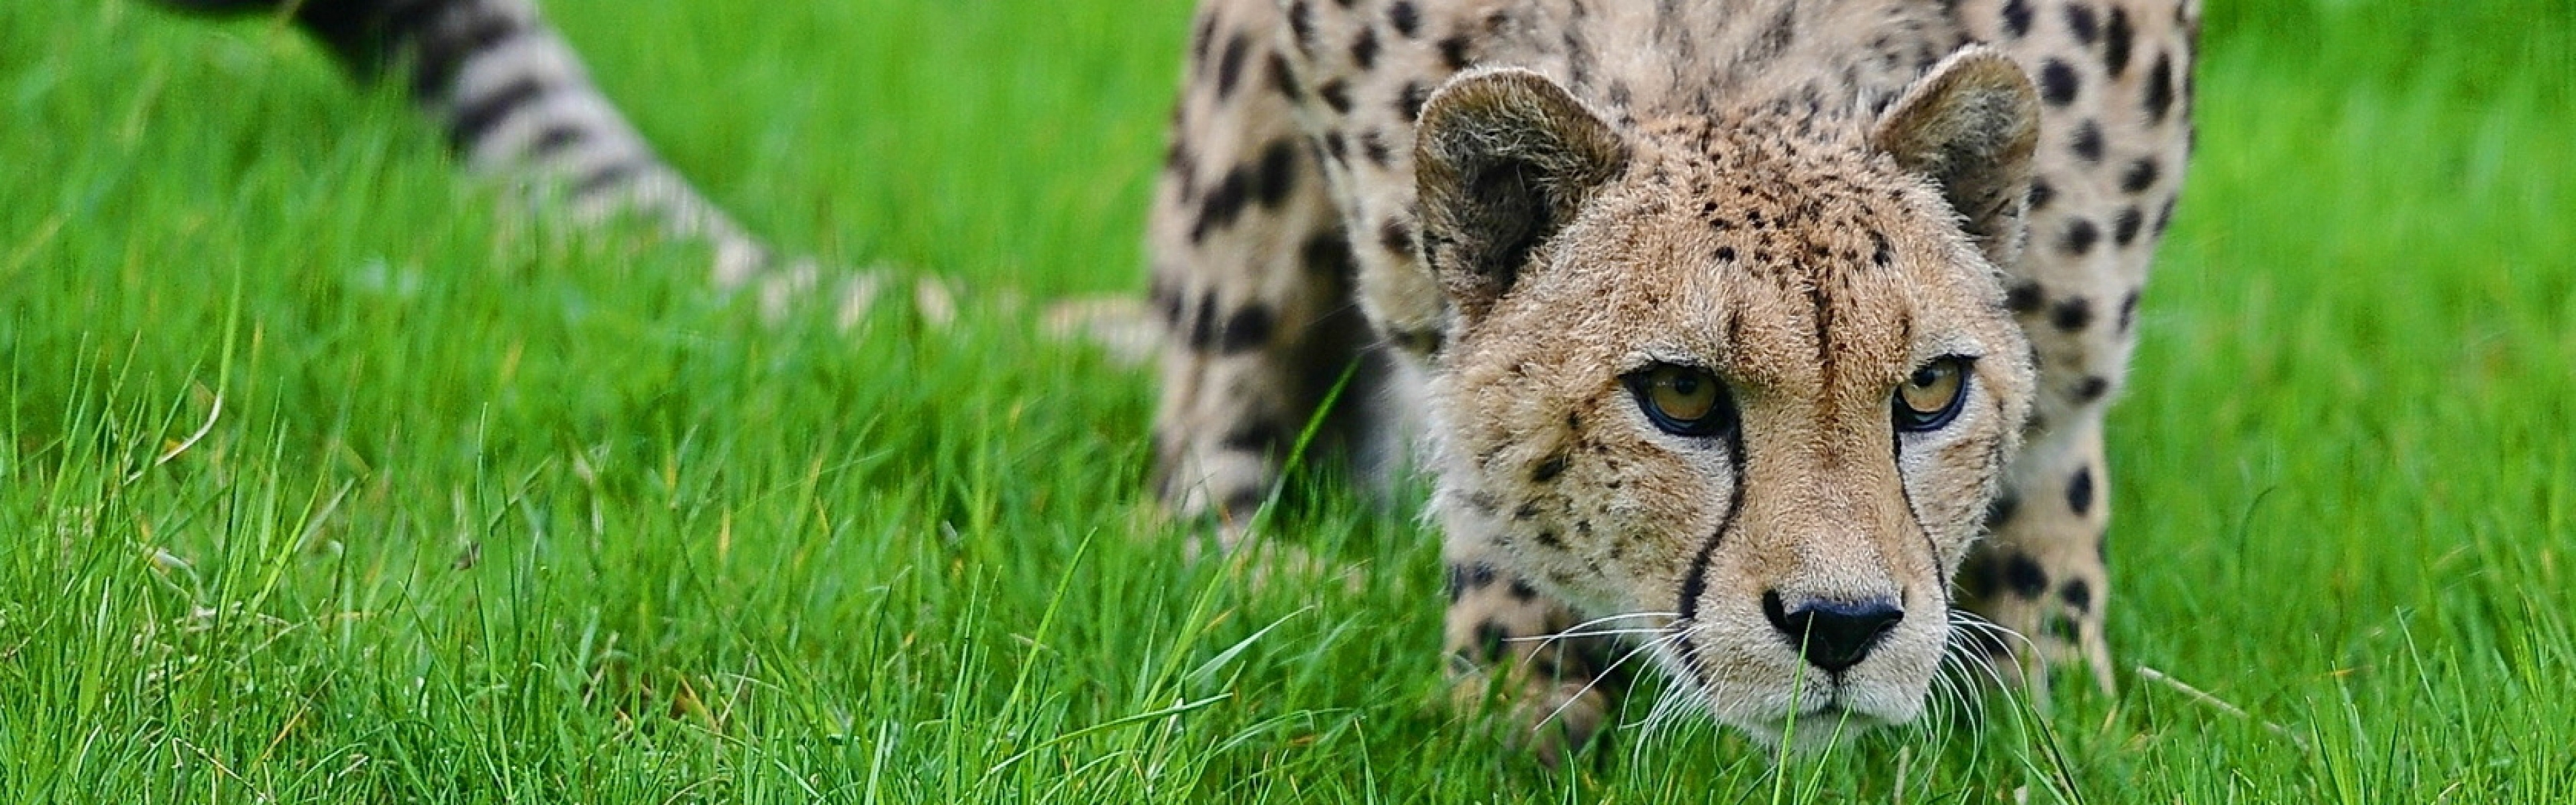 3840x1200 Wallpaper cheetah, grass, hunting, pose, lurk, big cat, spotted